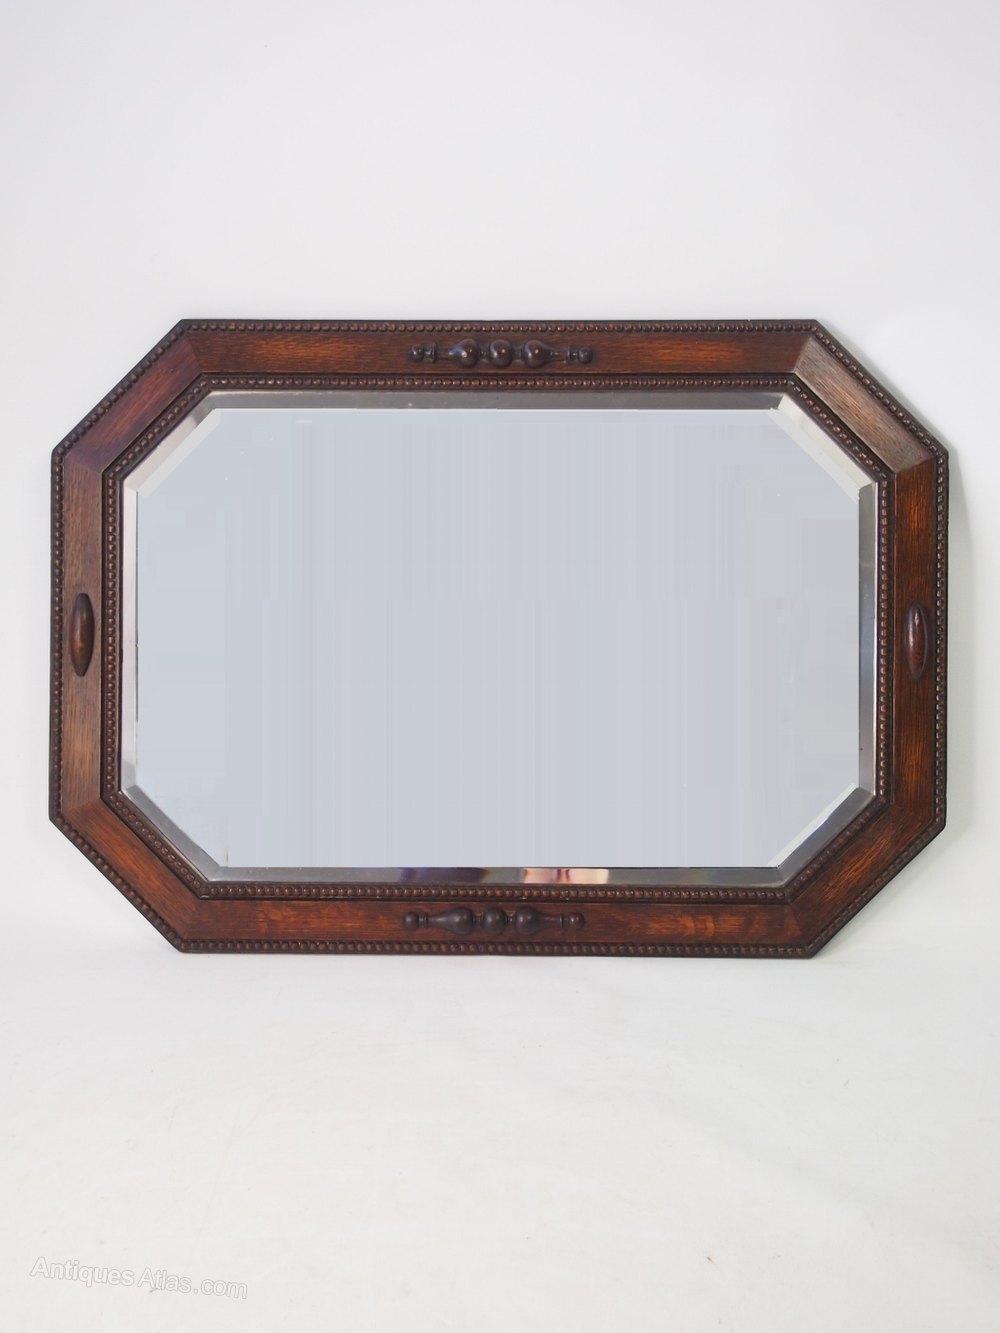 Antiques atlas oak framed mirror or overmantle for Overmantle mirror